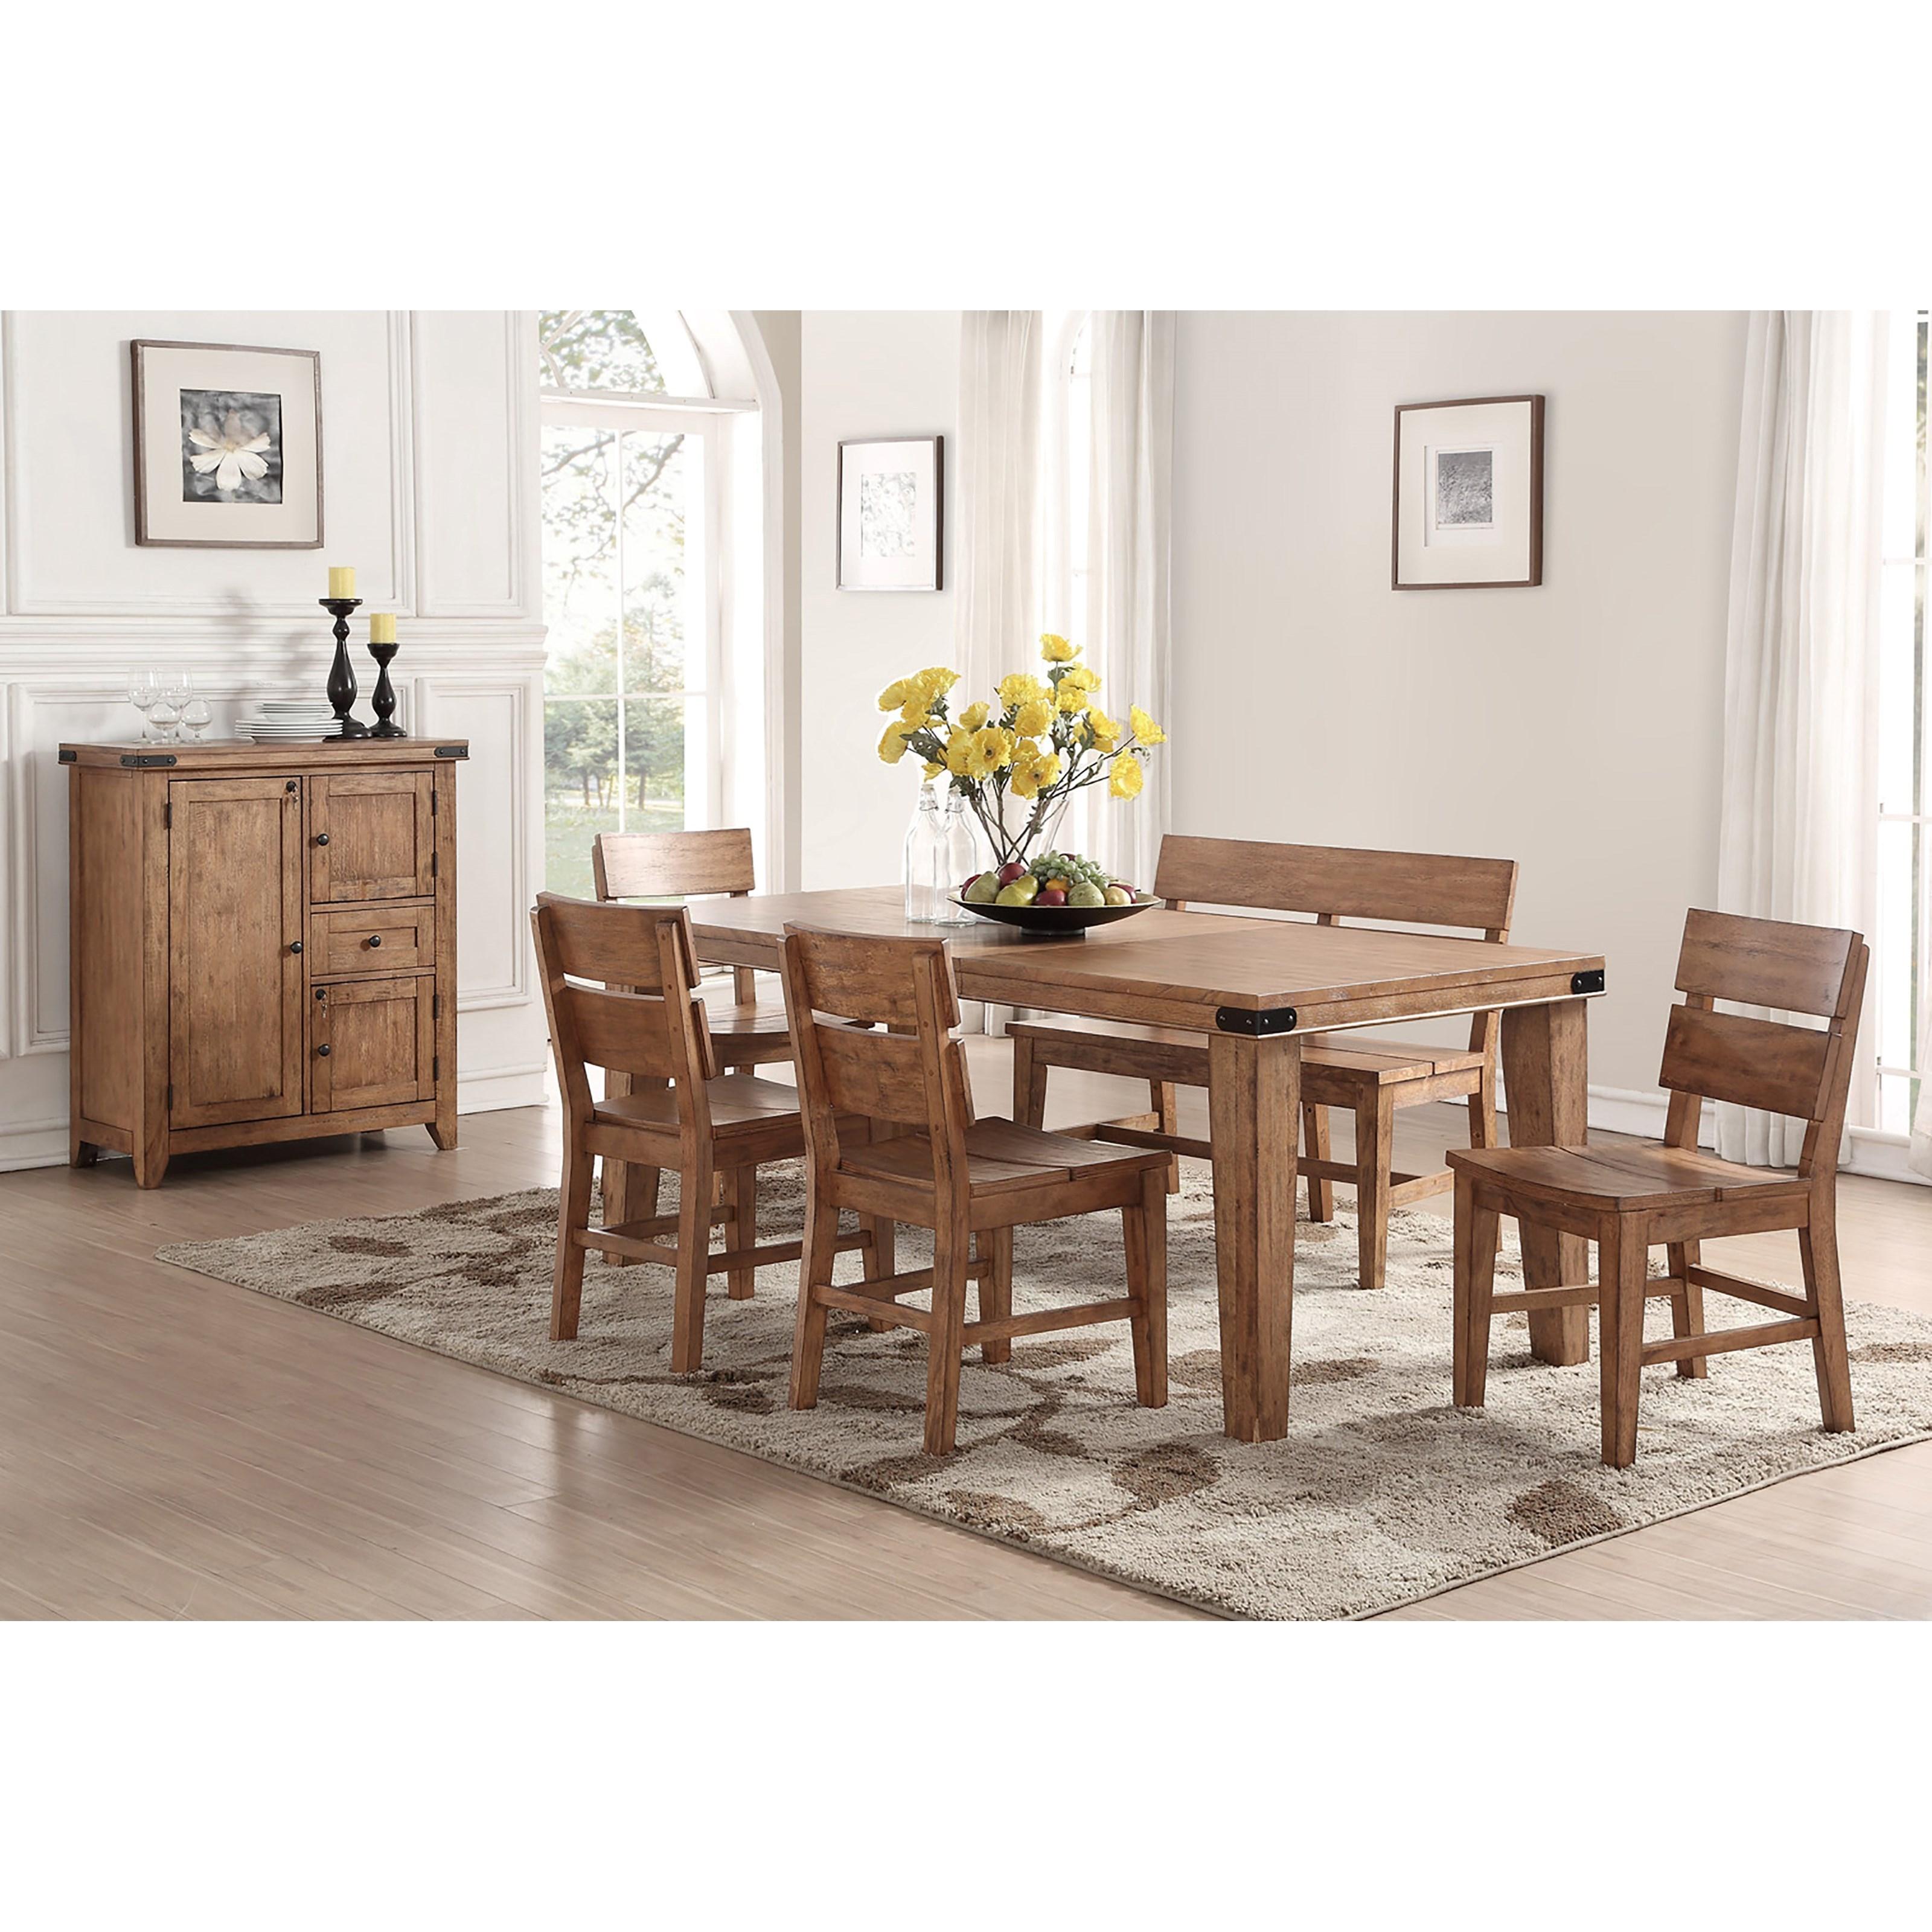 E.C.I. Furniture Shenandoah 6 Pc Dining Set | Northeast ...